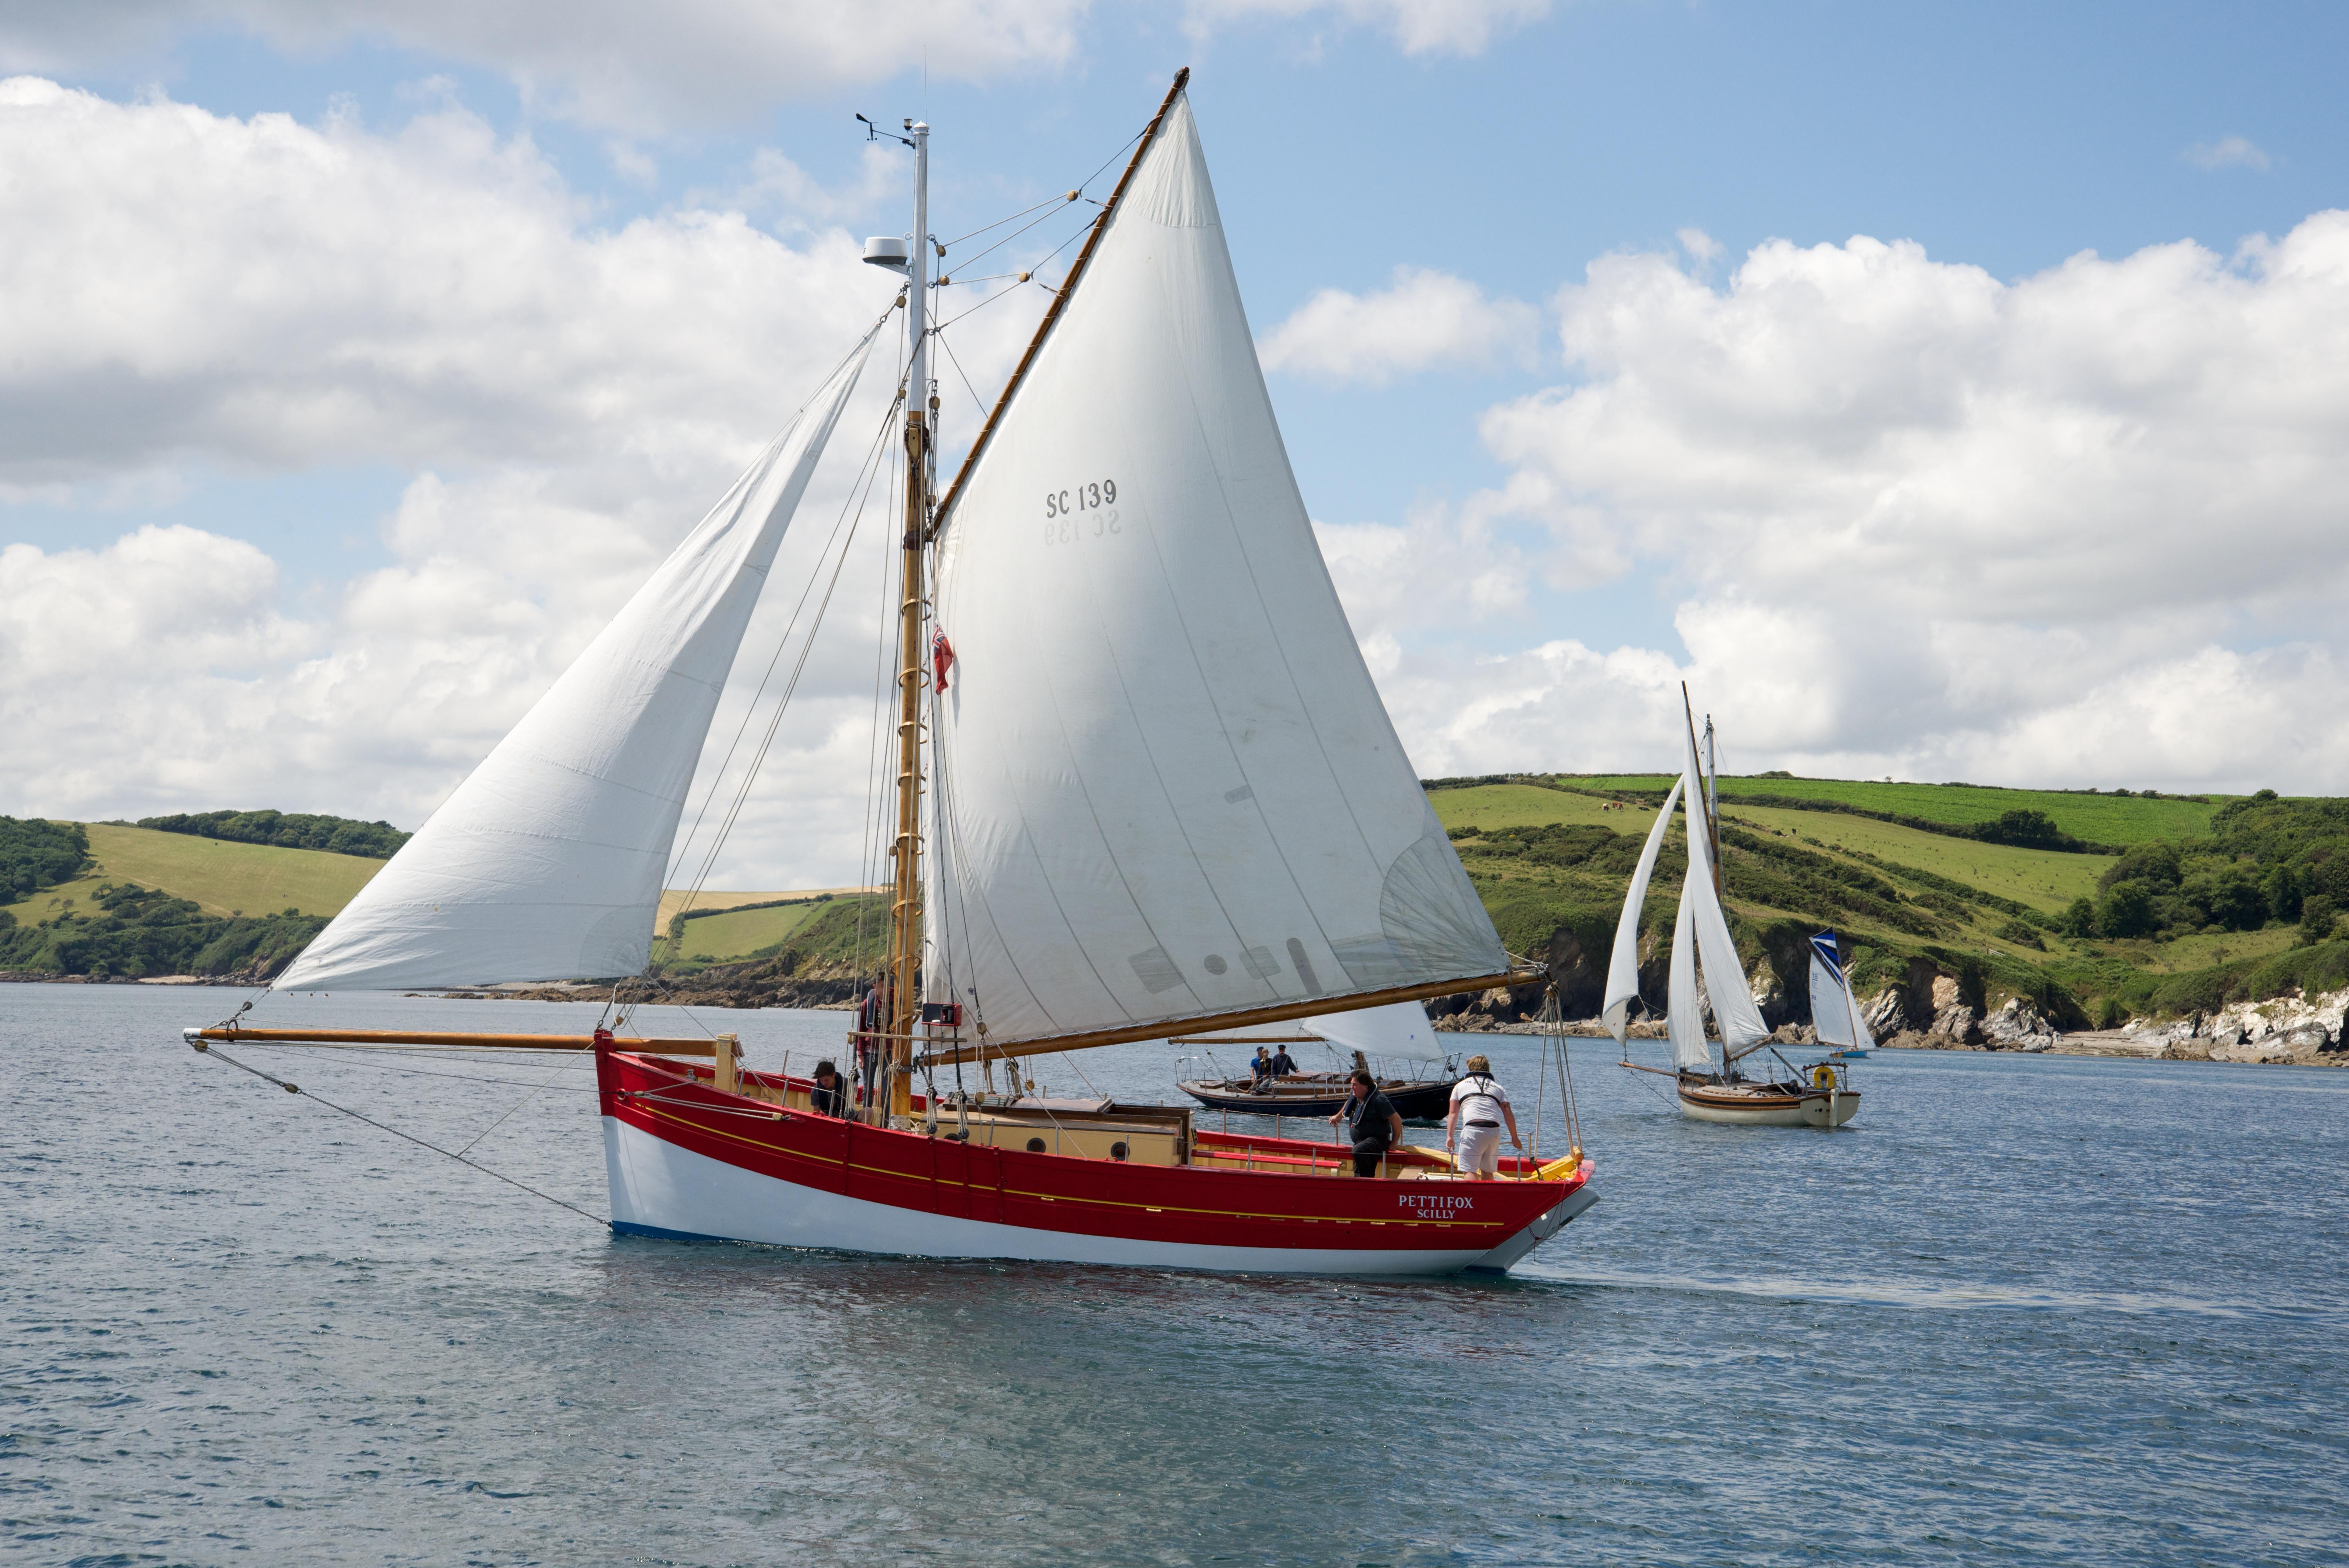 Pettifox Sea Charters - Classic Sailing Boat Trips from Polruan ...